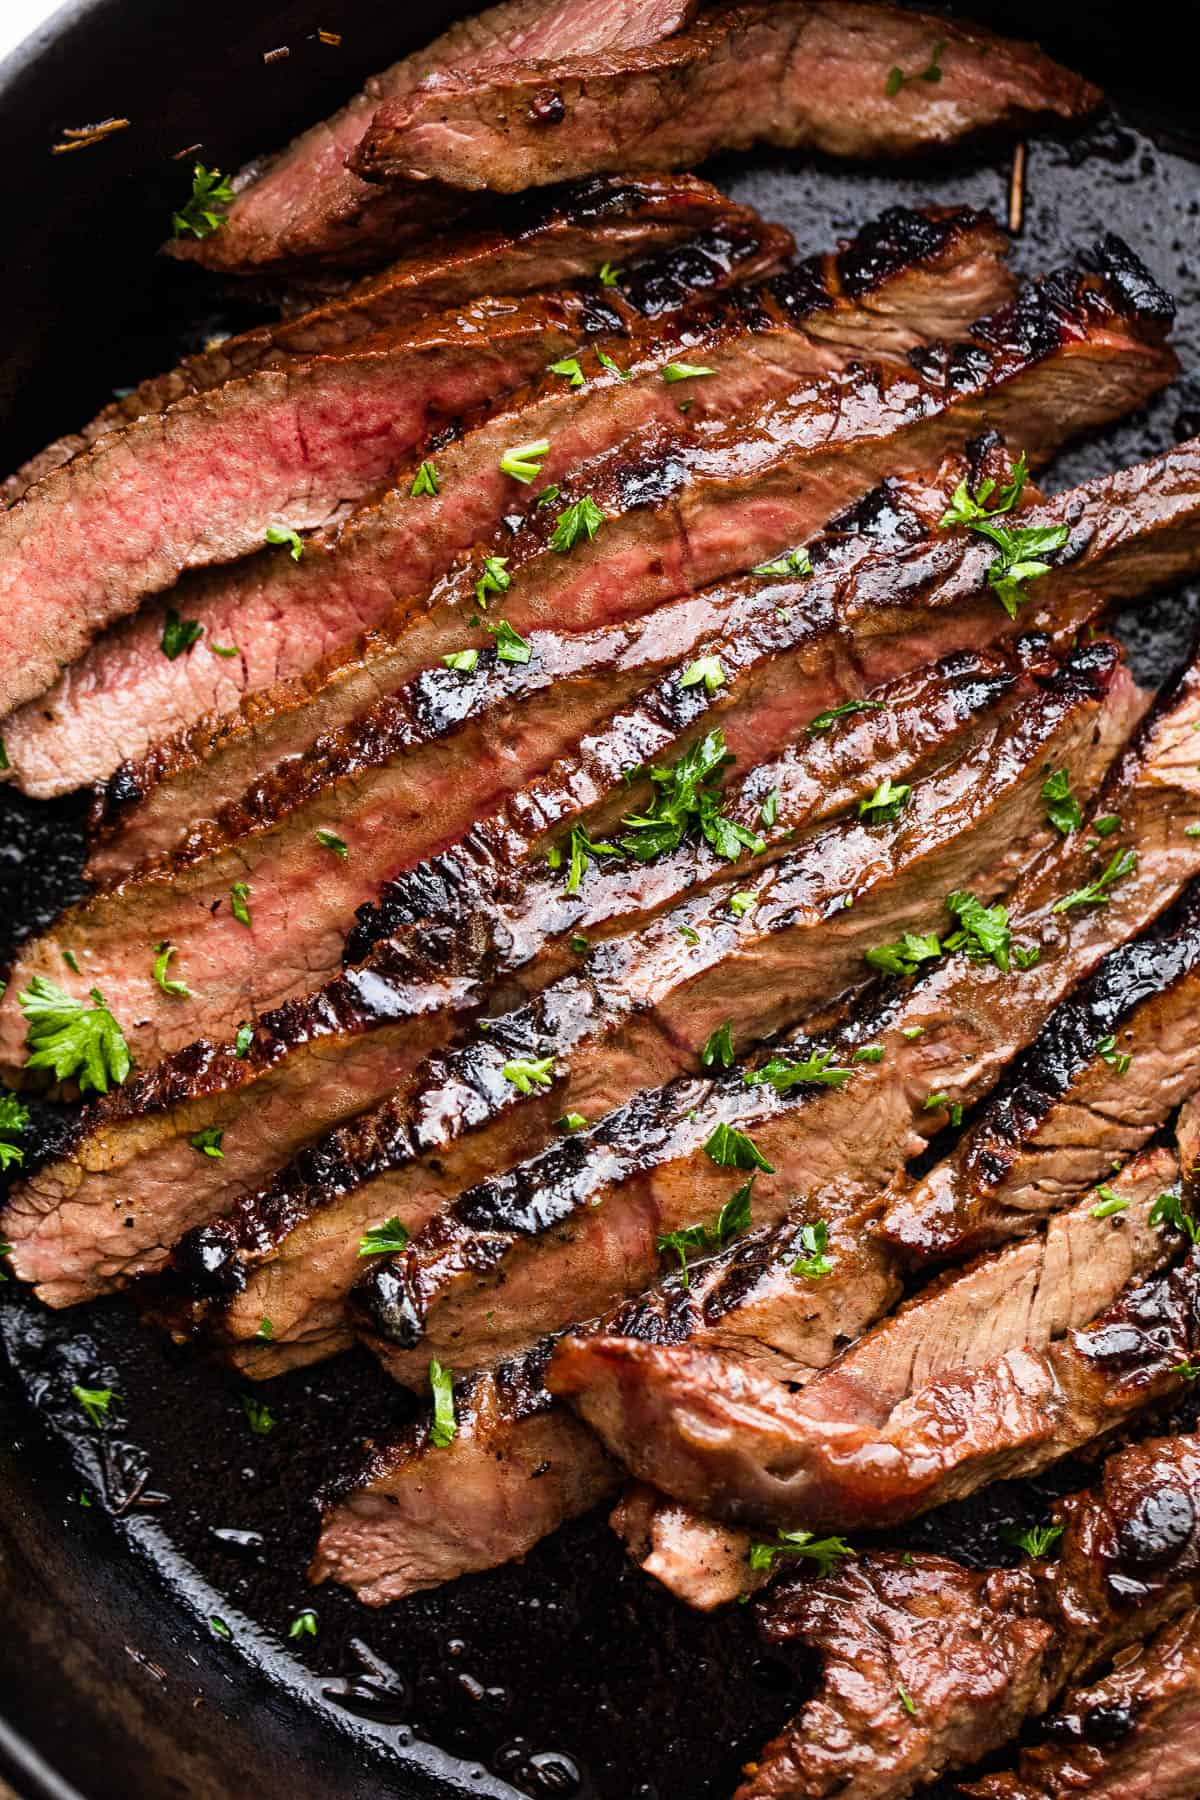 sliced cooked steak